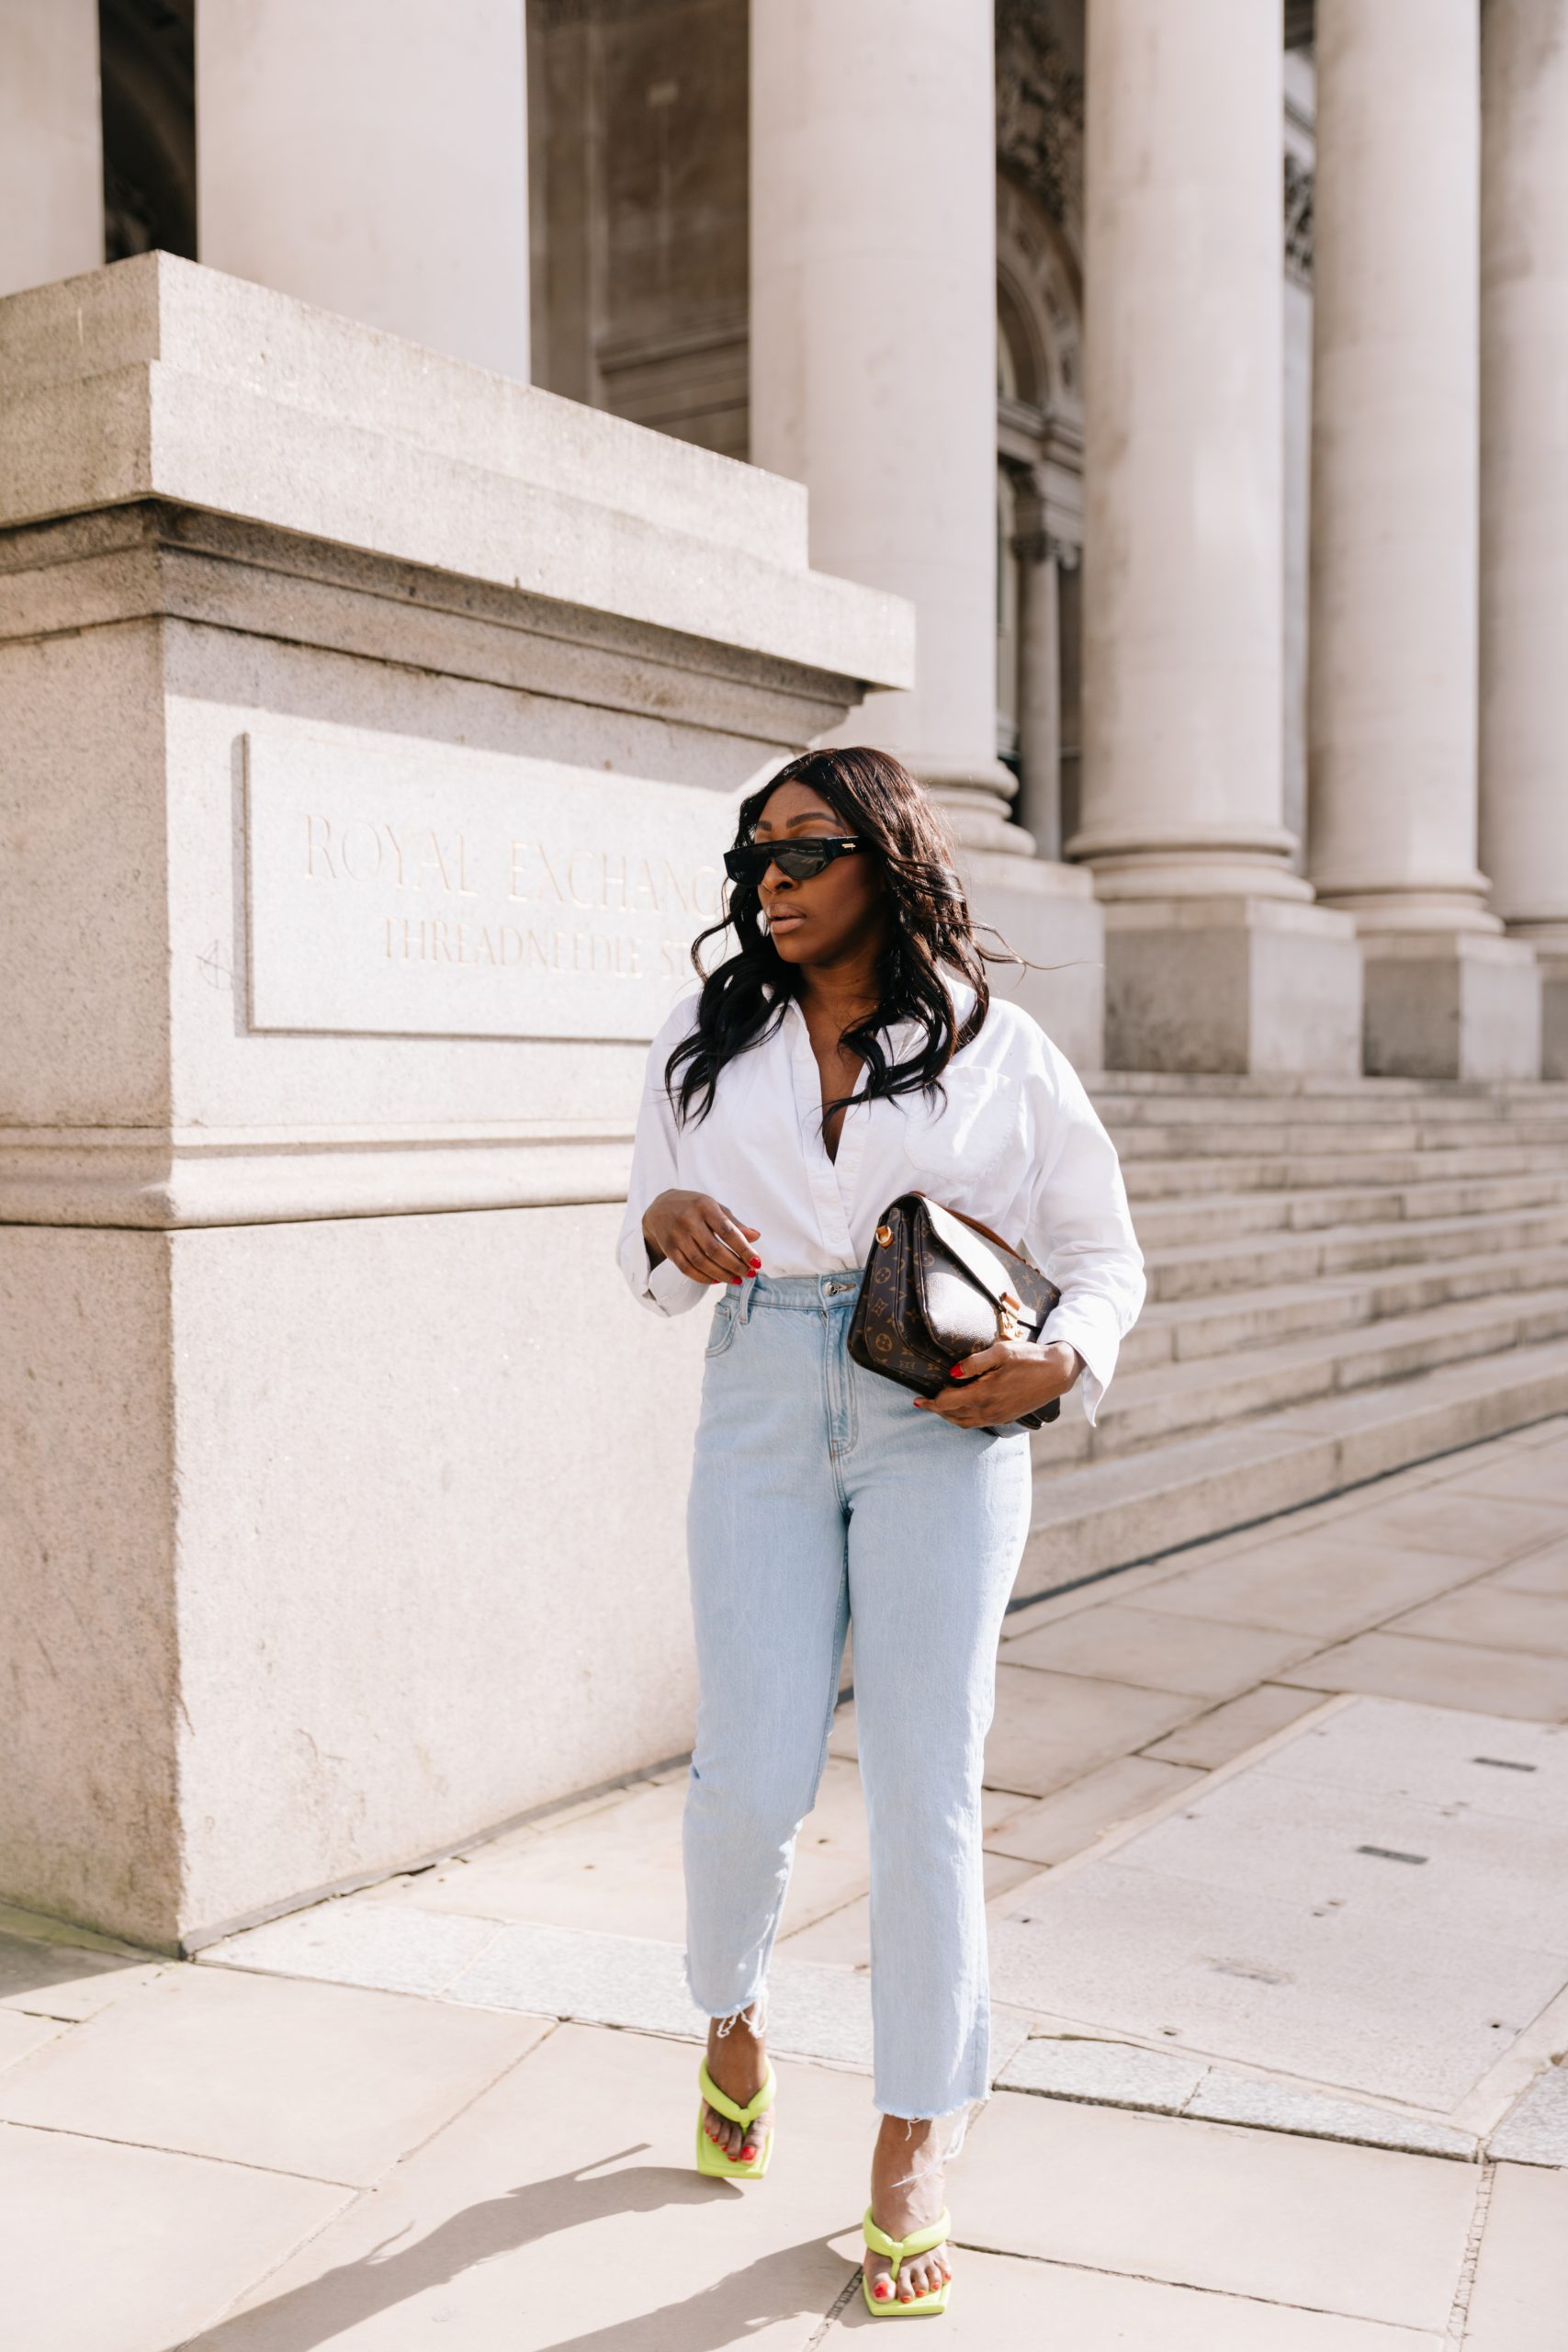 High Waisted Jeans & Denim Trends - high waisted jeans - bottega veneta sunglasses - Tasha Antwi